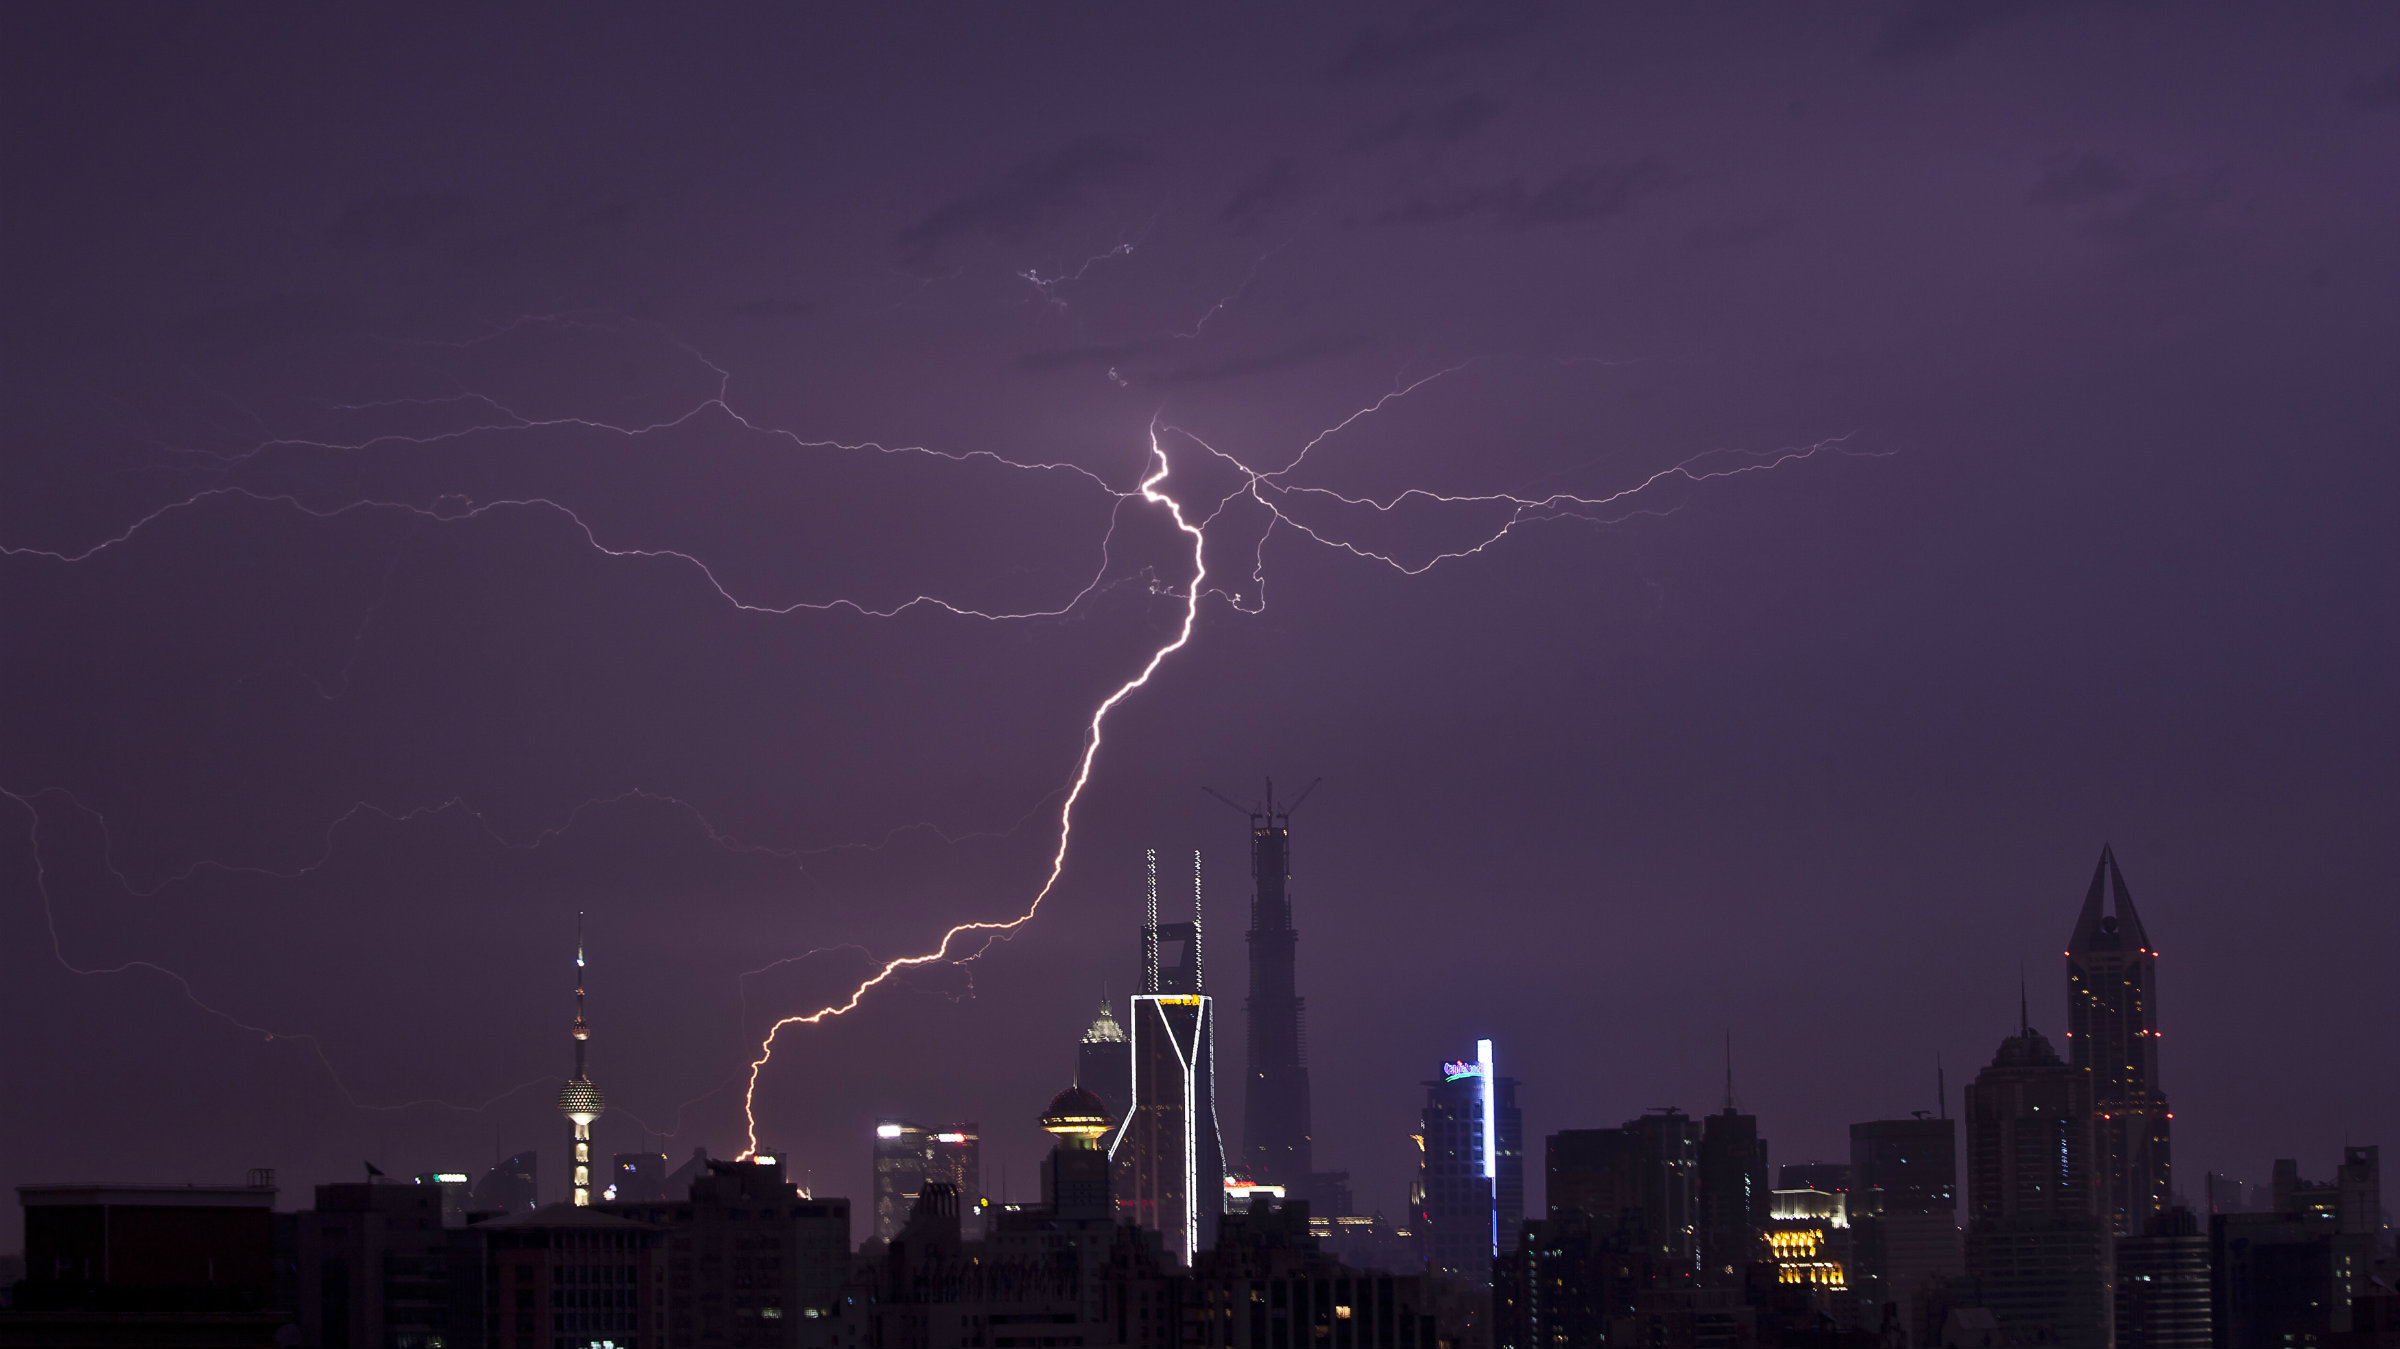 Shanghai lightning